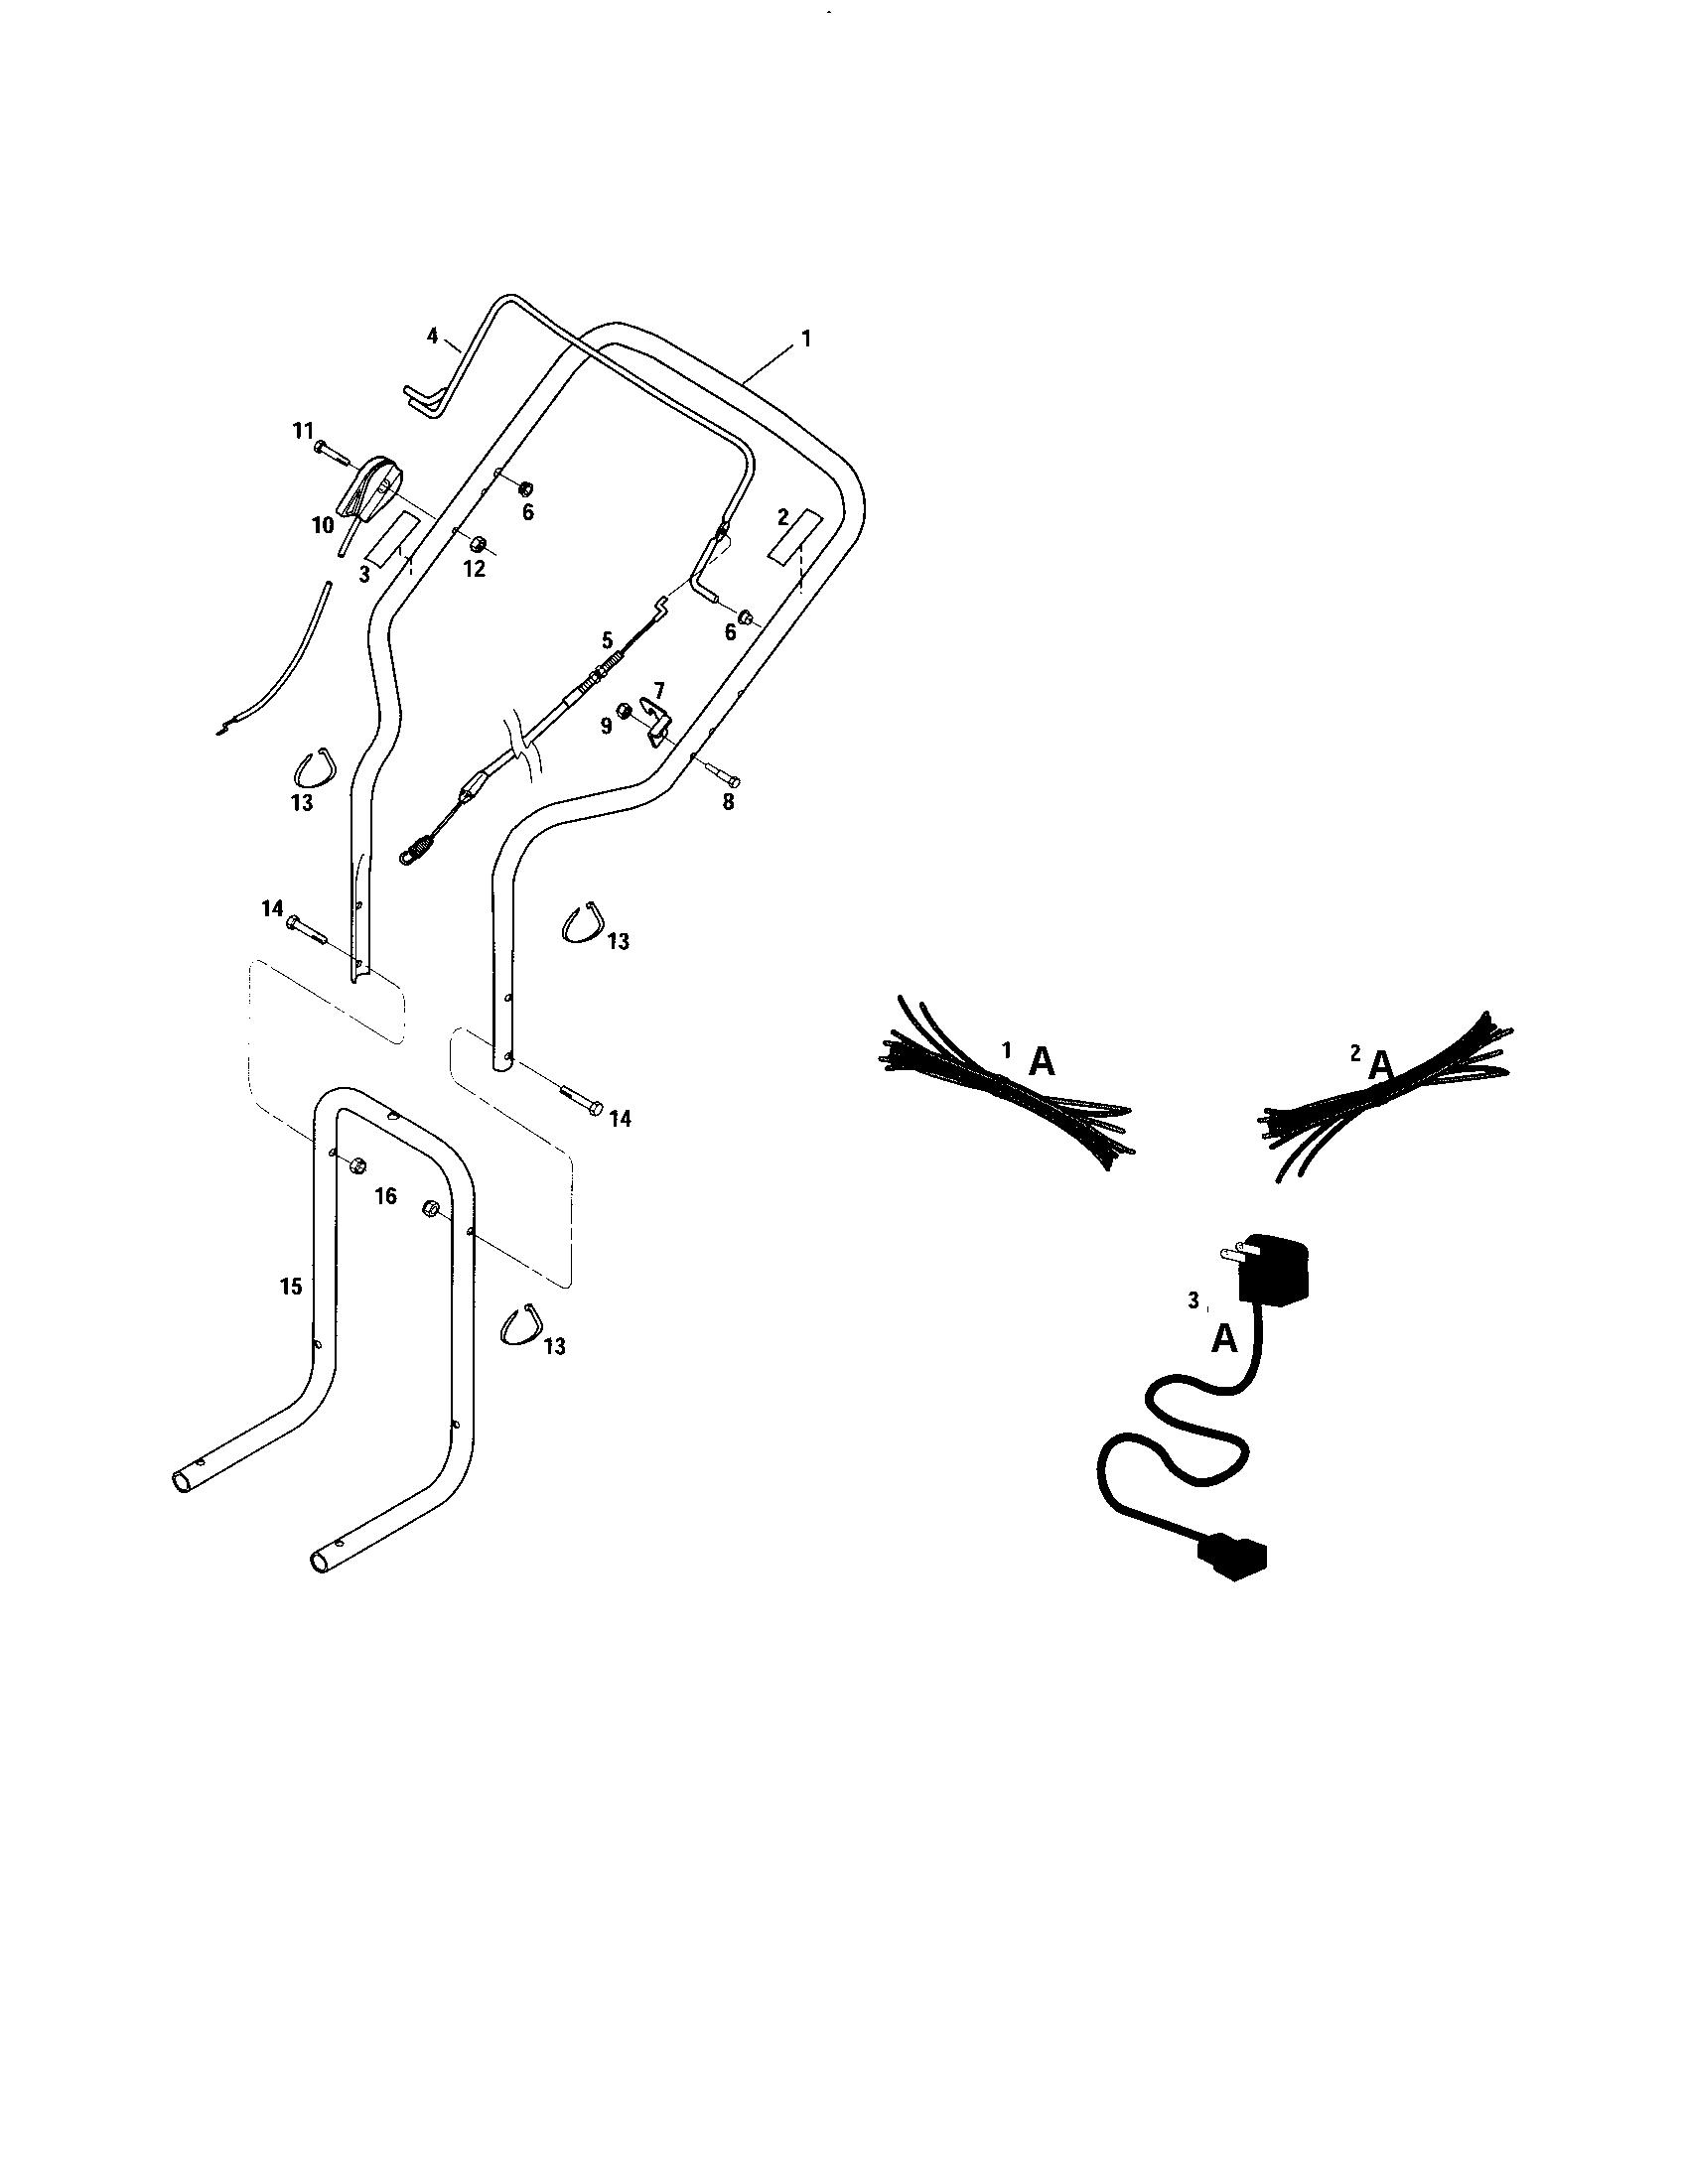 Troybilt model 52063 line trimmers/weedwackers, gas